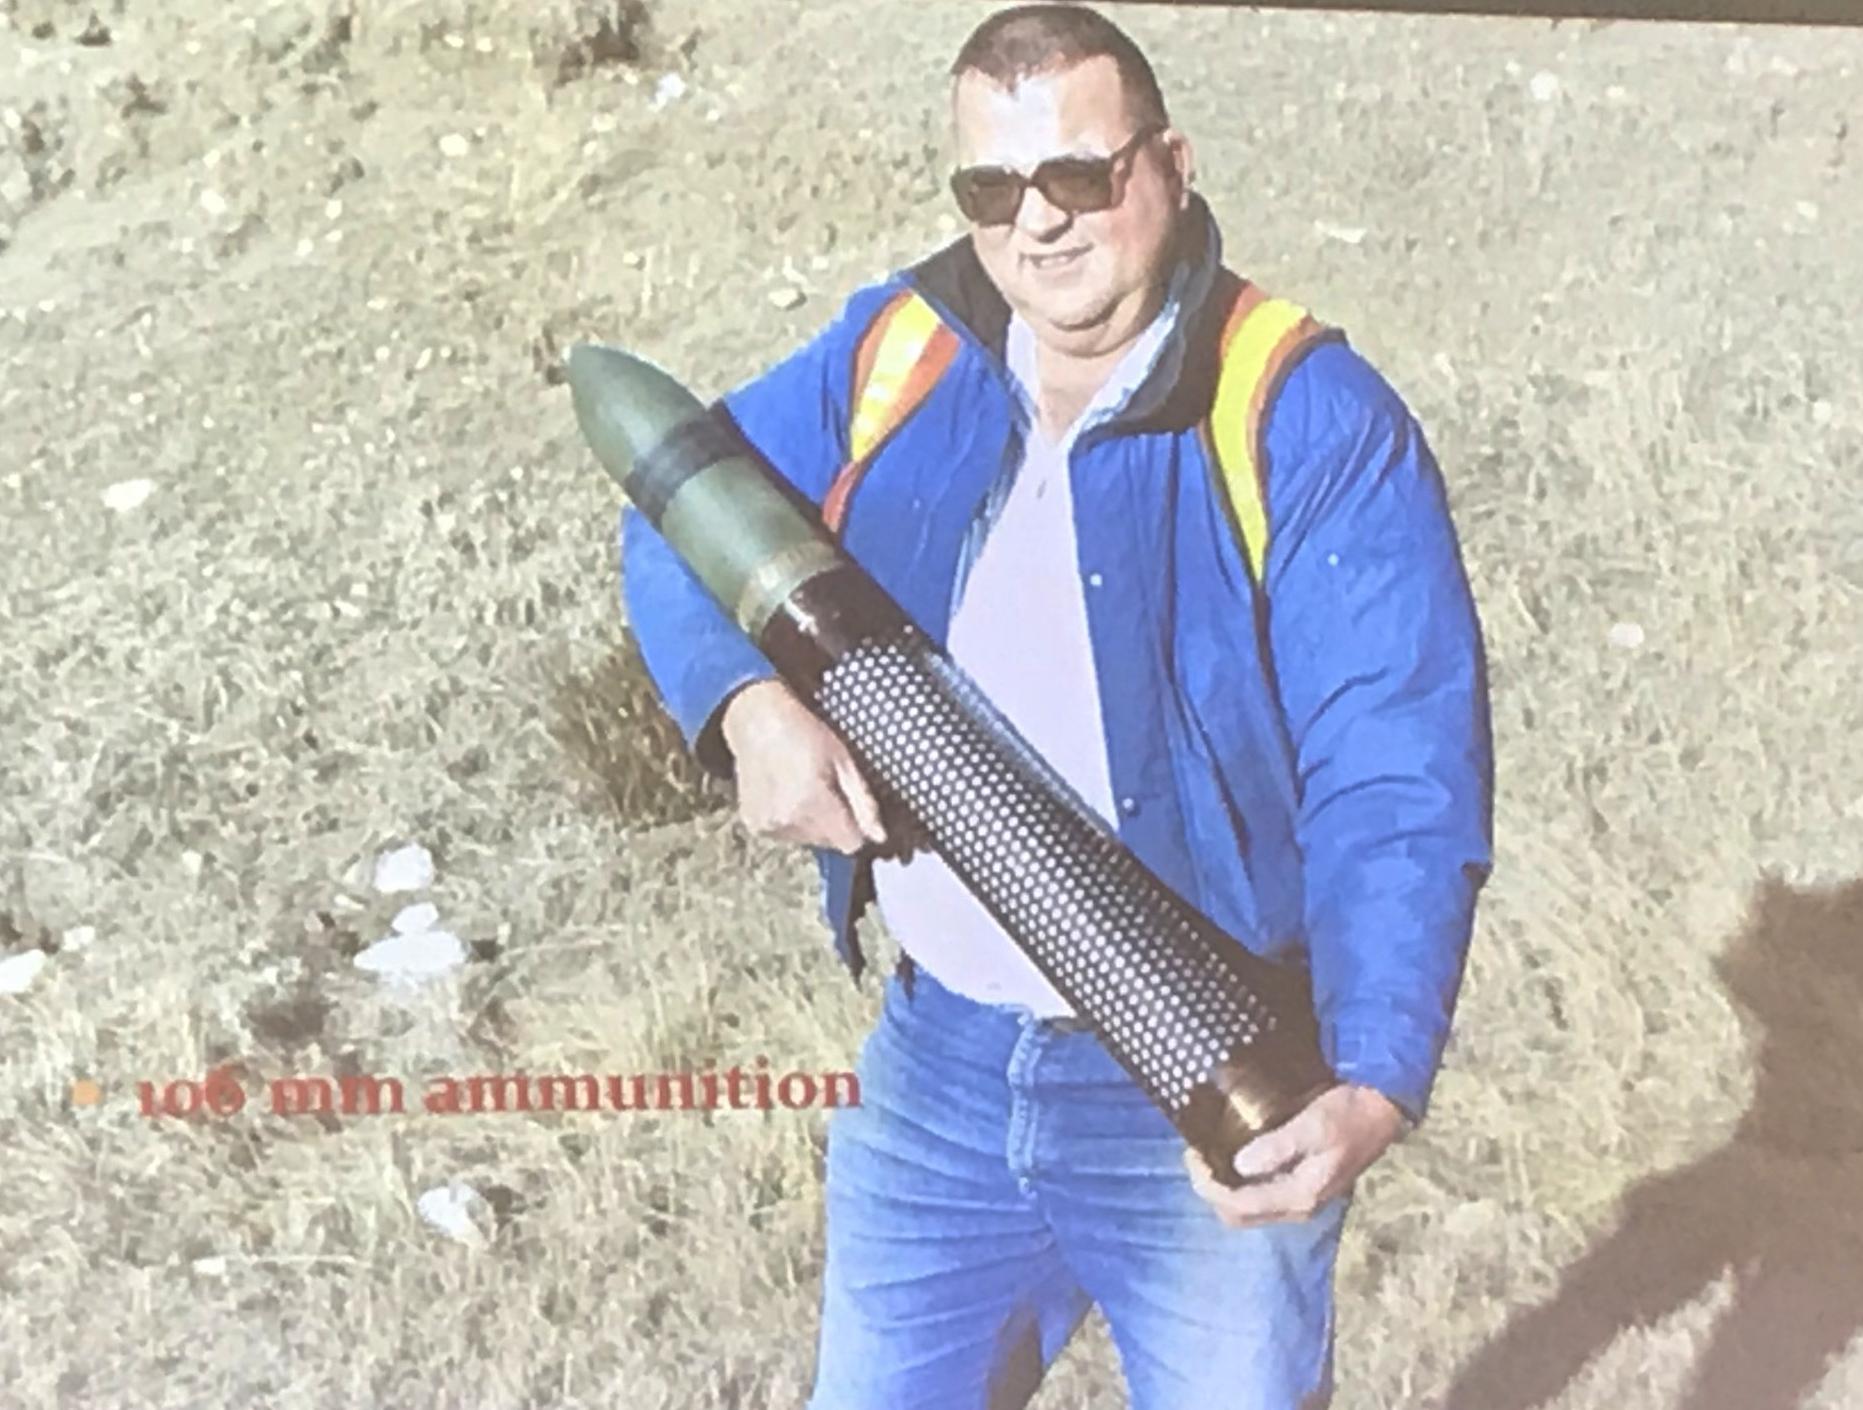 CDOT avalanche worker holding artillery